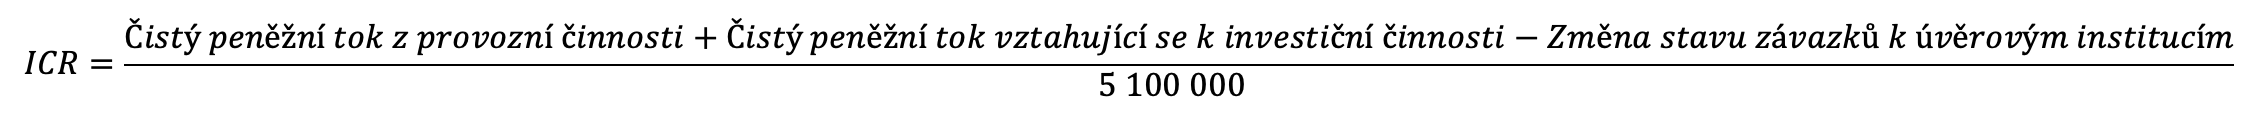 Výpočet ICR